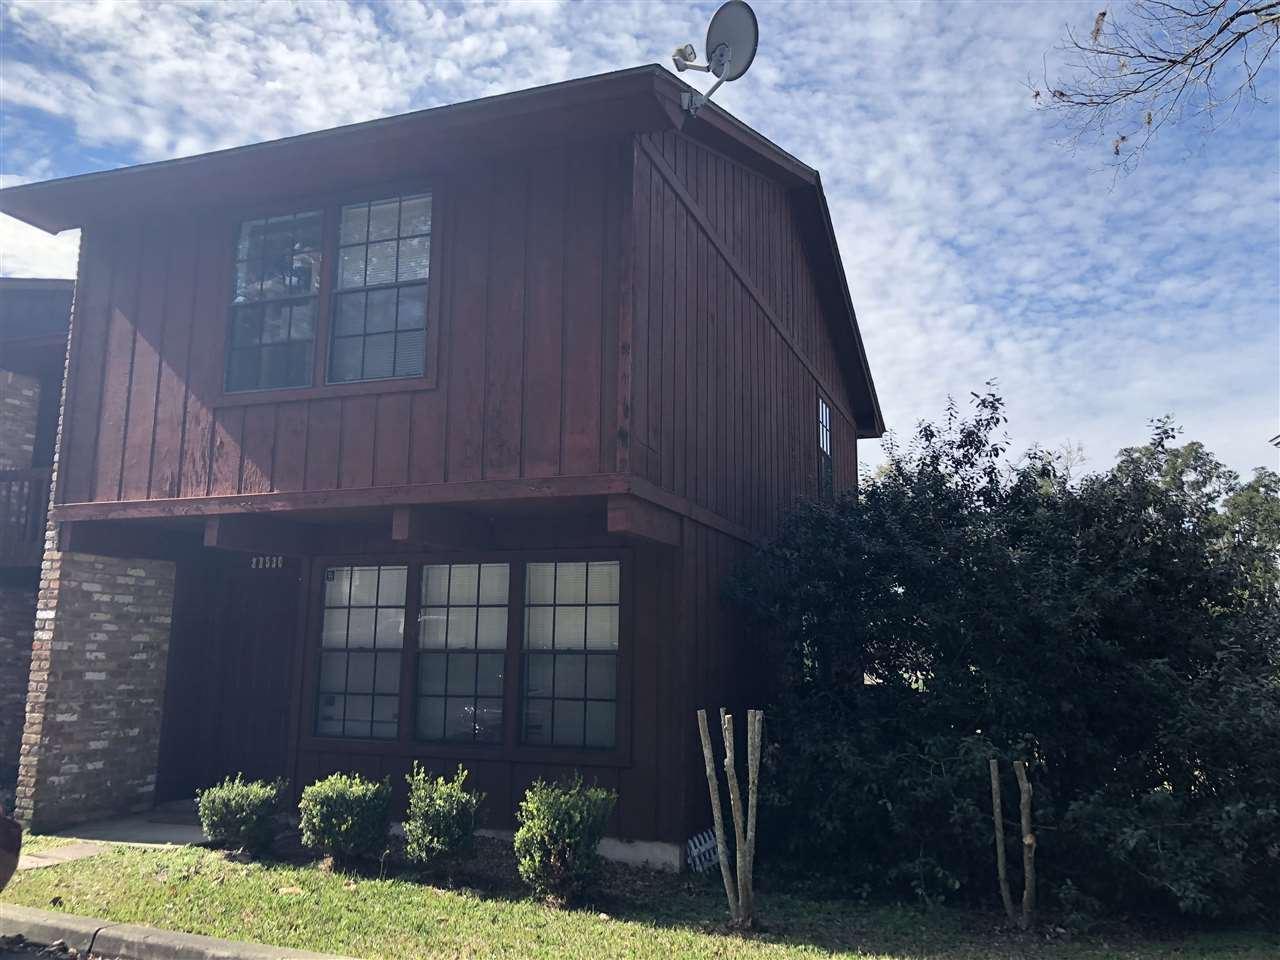 2253 Shady Timbers Circle #C, Tallahassee, FL 32304 - MLS#: 328800